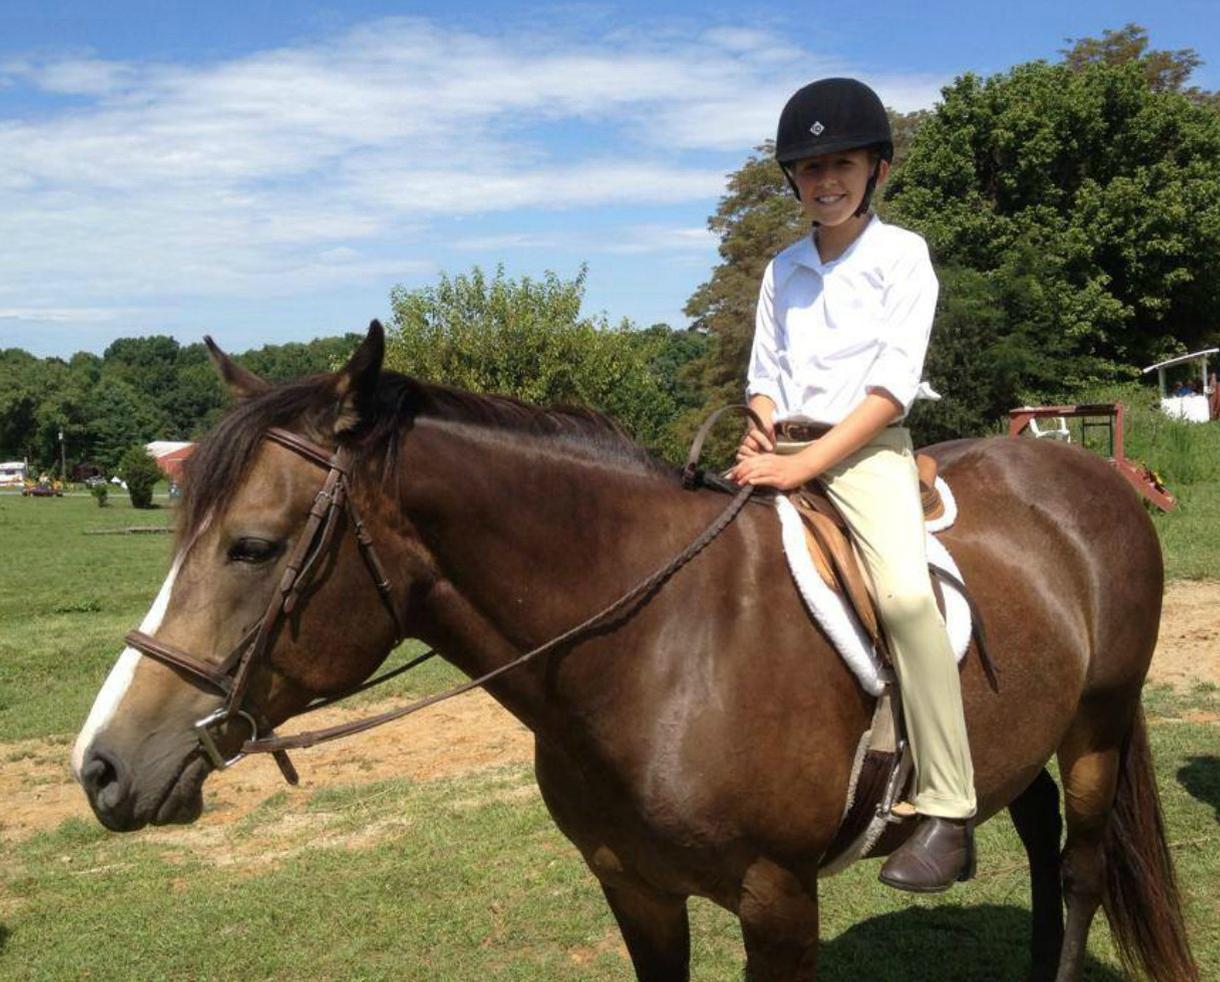 Horseback Riding Lessons at The Big Easy Farm